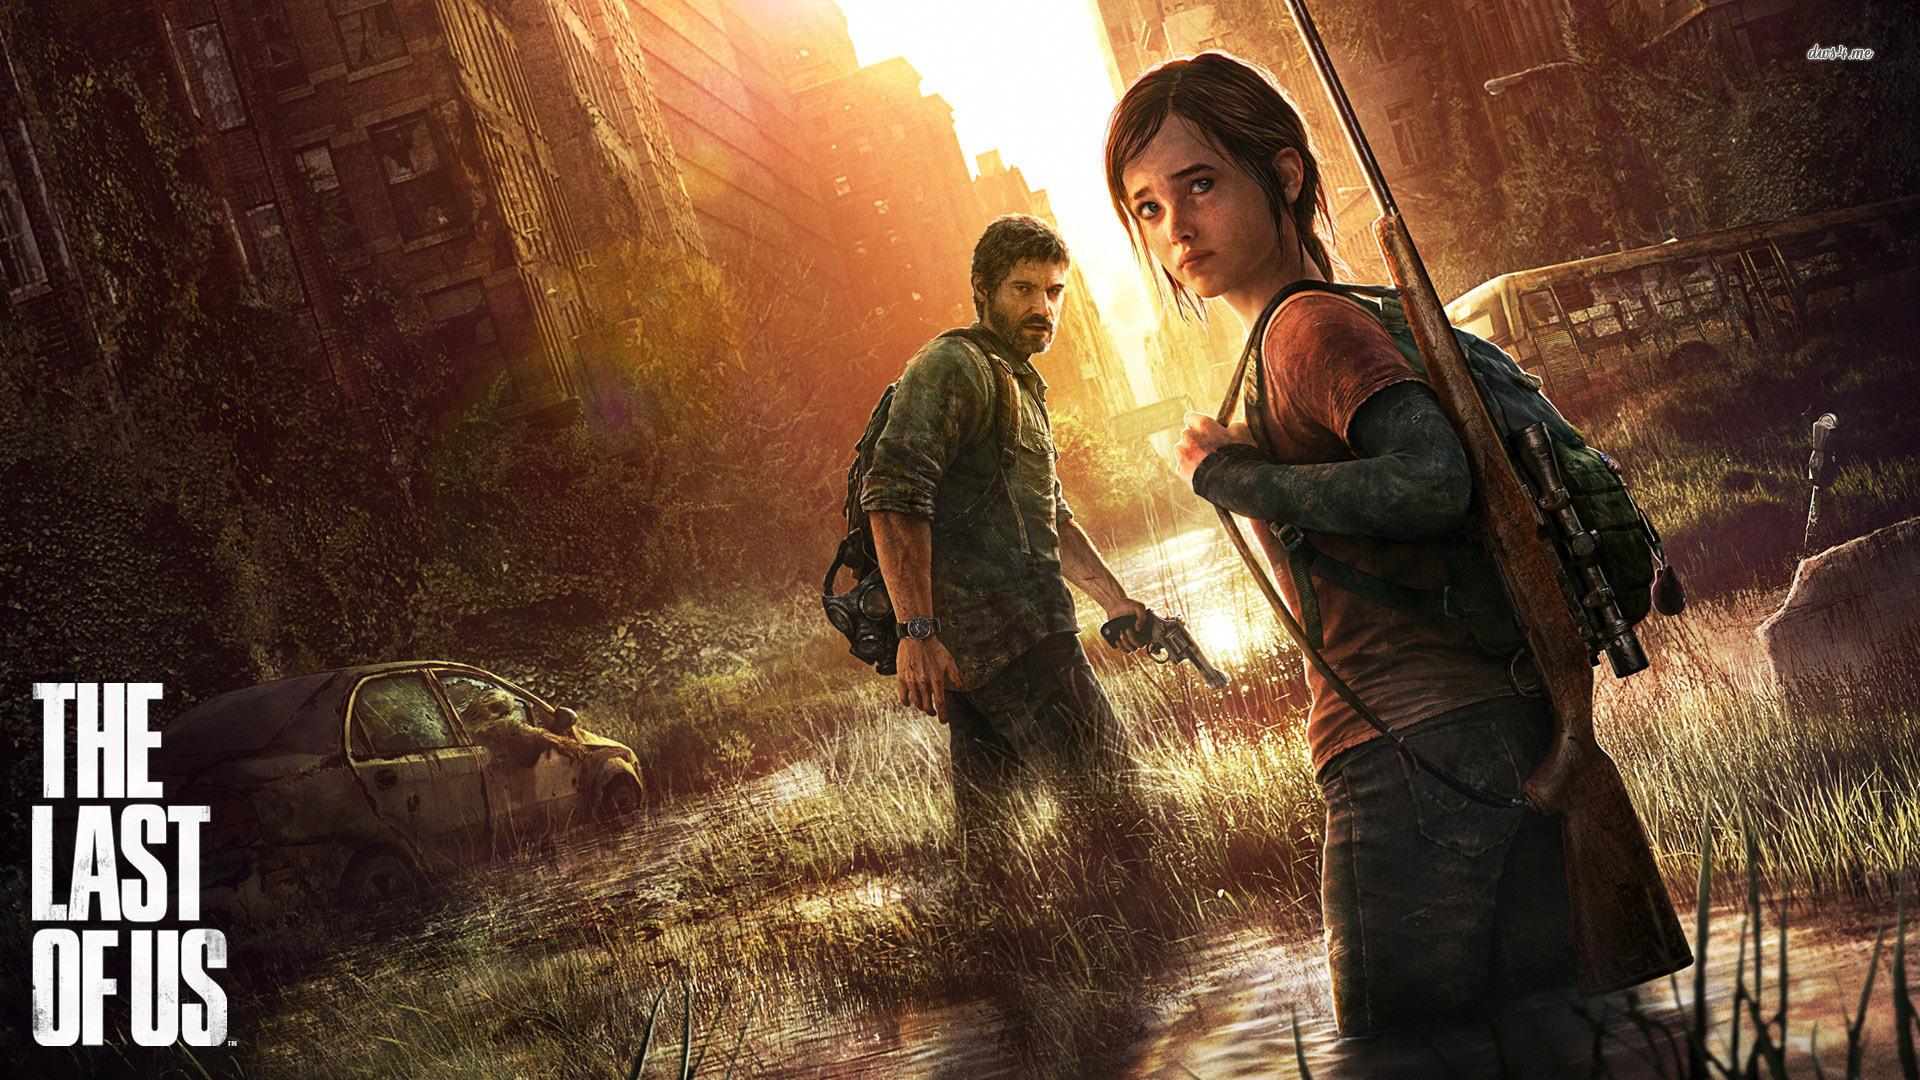 Ellie   The Last of Us wallpaper 1280x800 Joel and Ellie   The Last 1920x1080